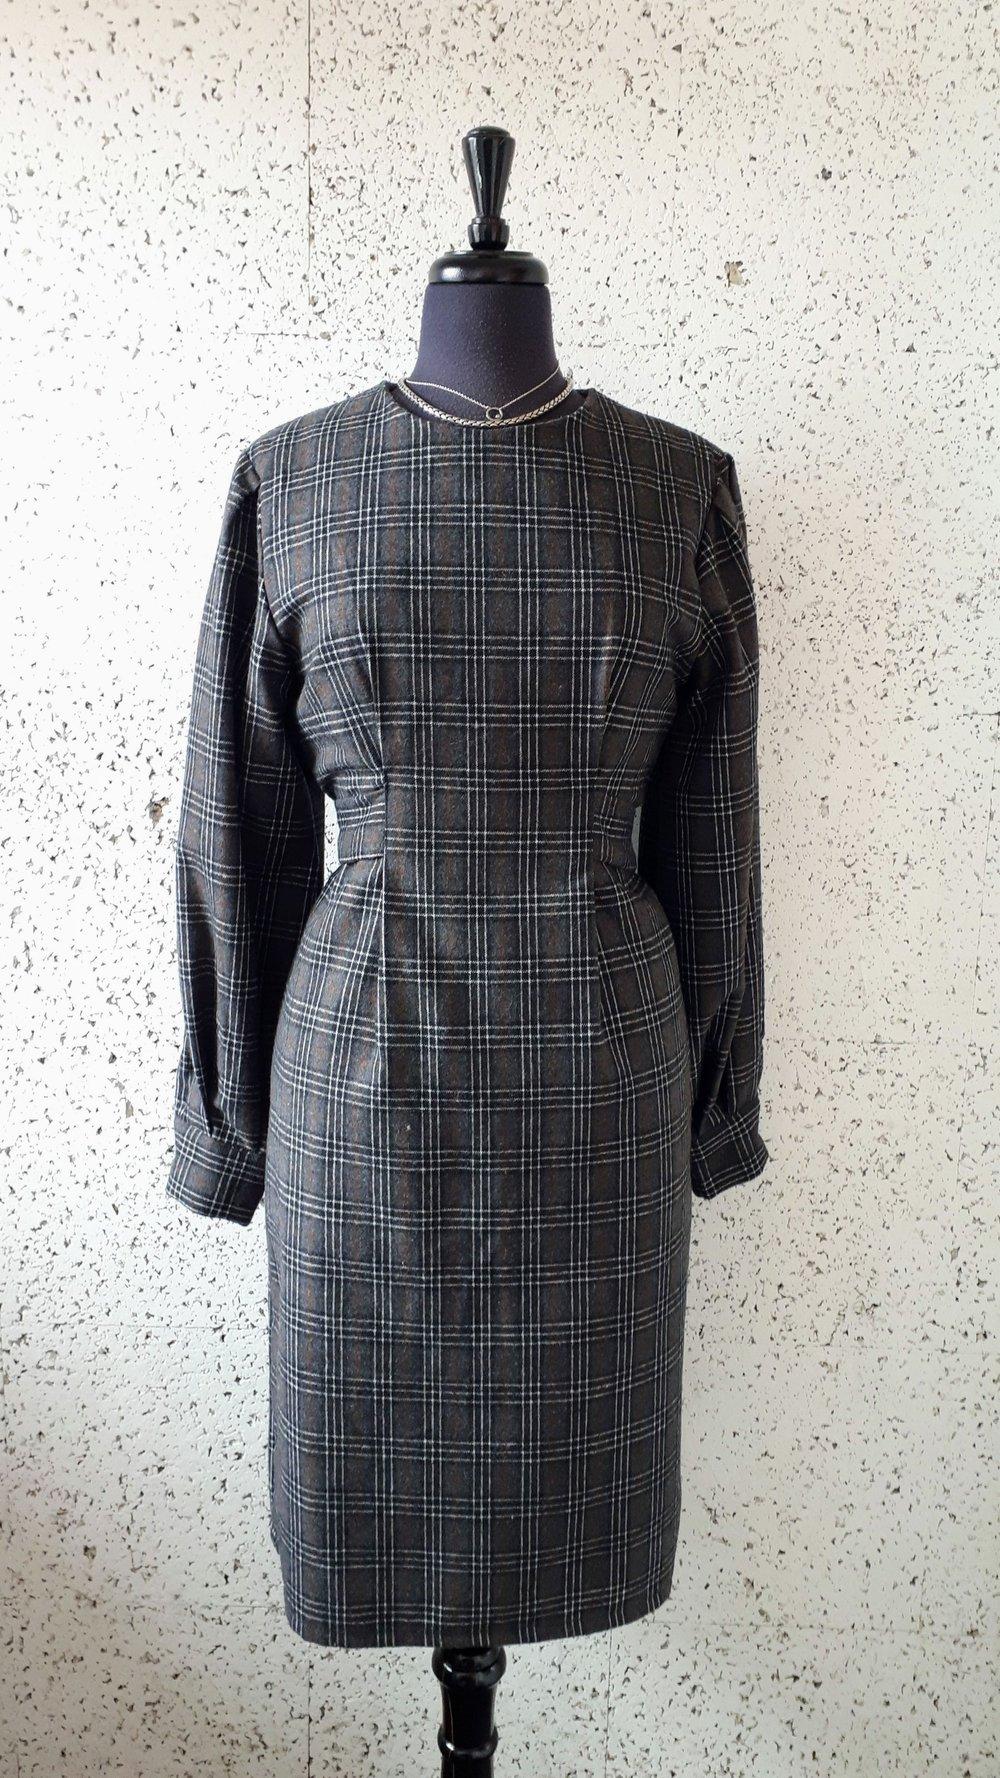 Oak + Fort dress (NWT); Size M, $62